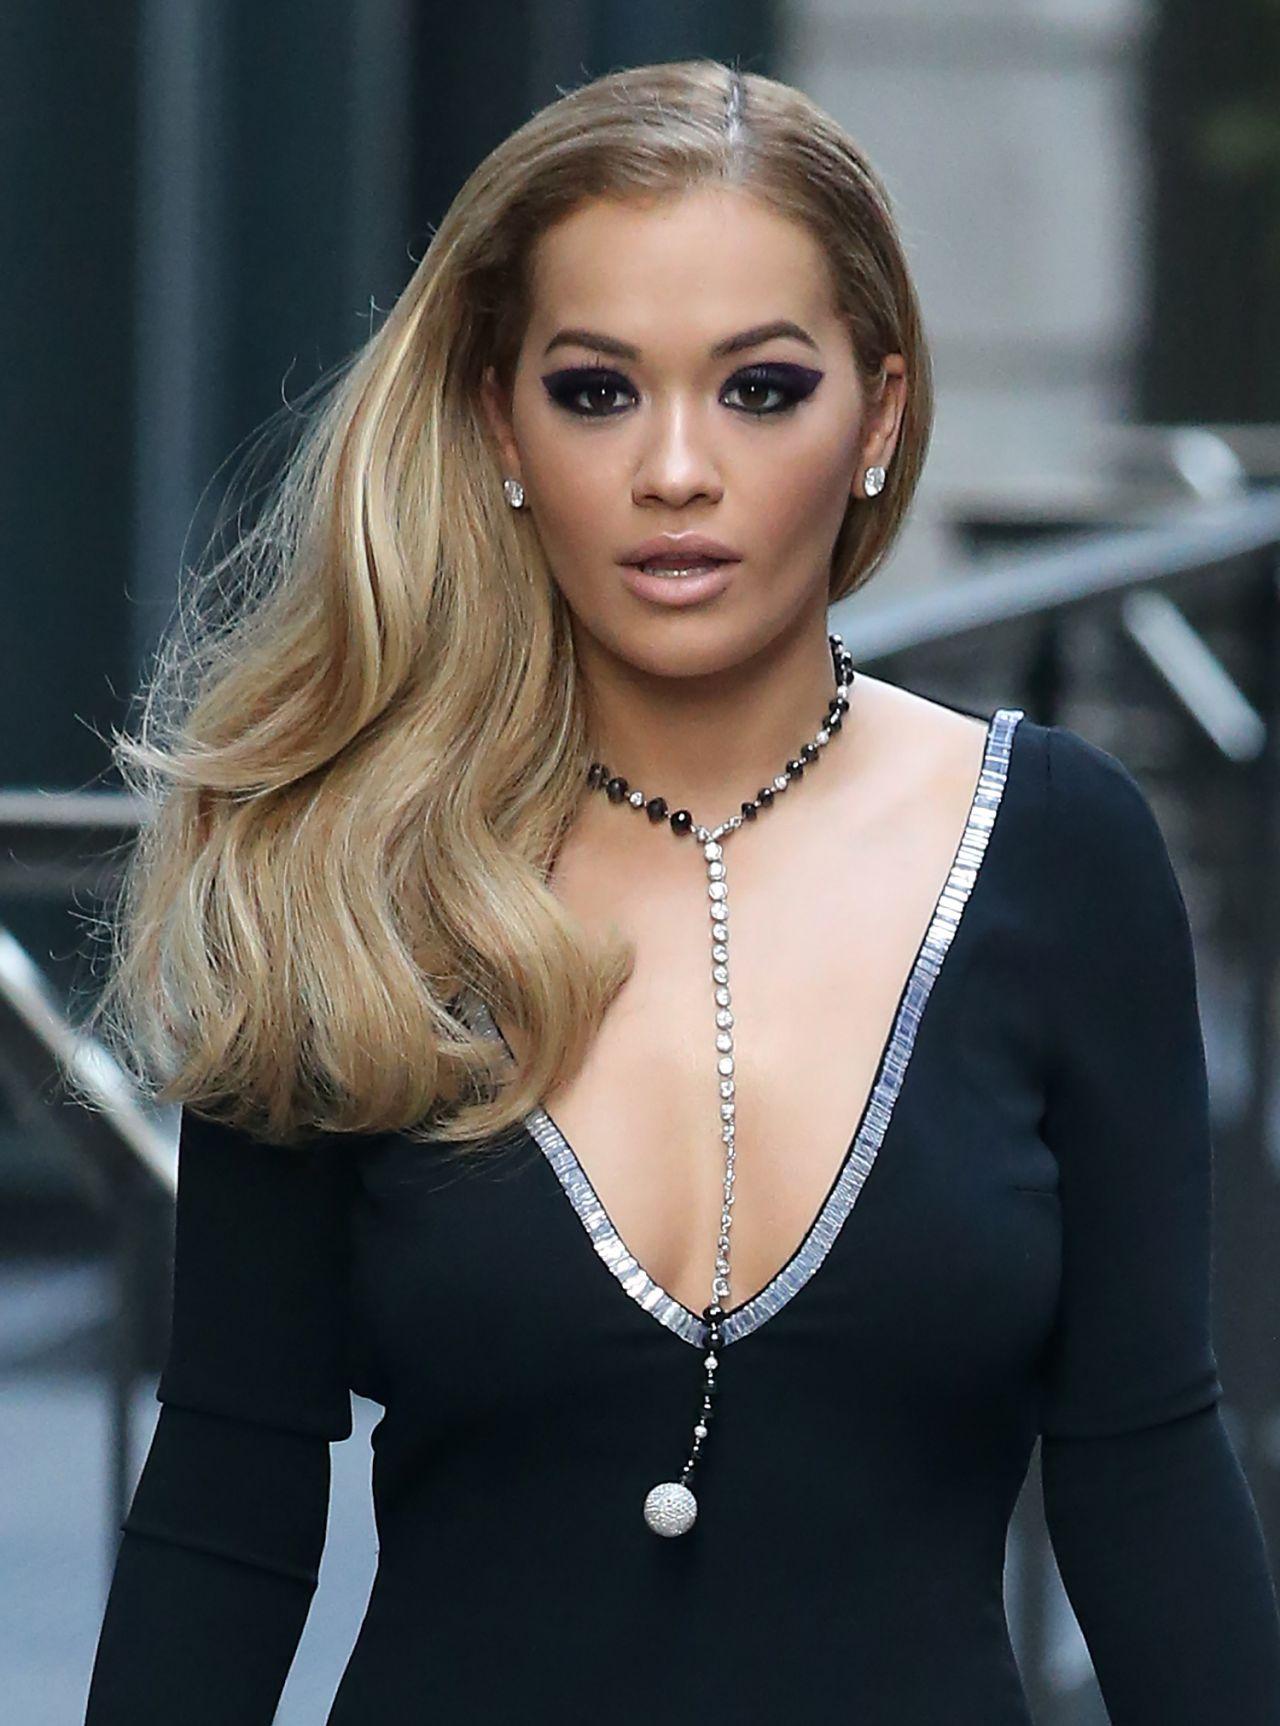 Rita Ora Fashion Shoot Photos: Filming For America's Next Top